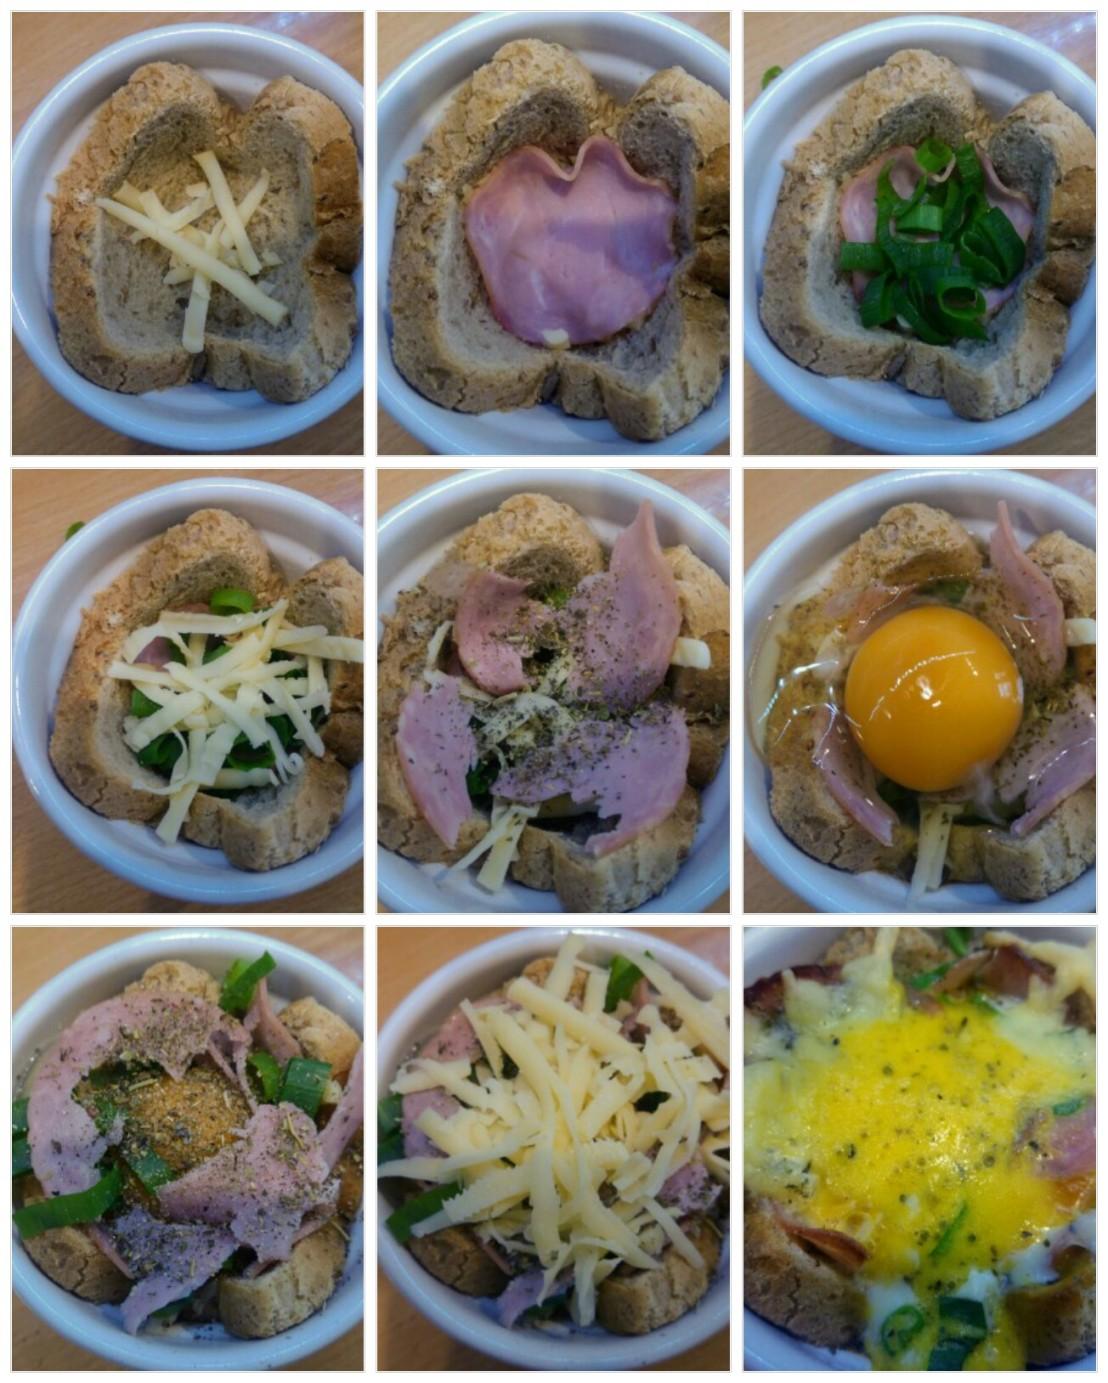 Collage of steps of making the breakfast ramekins